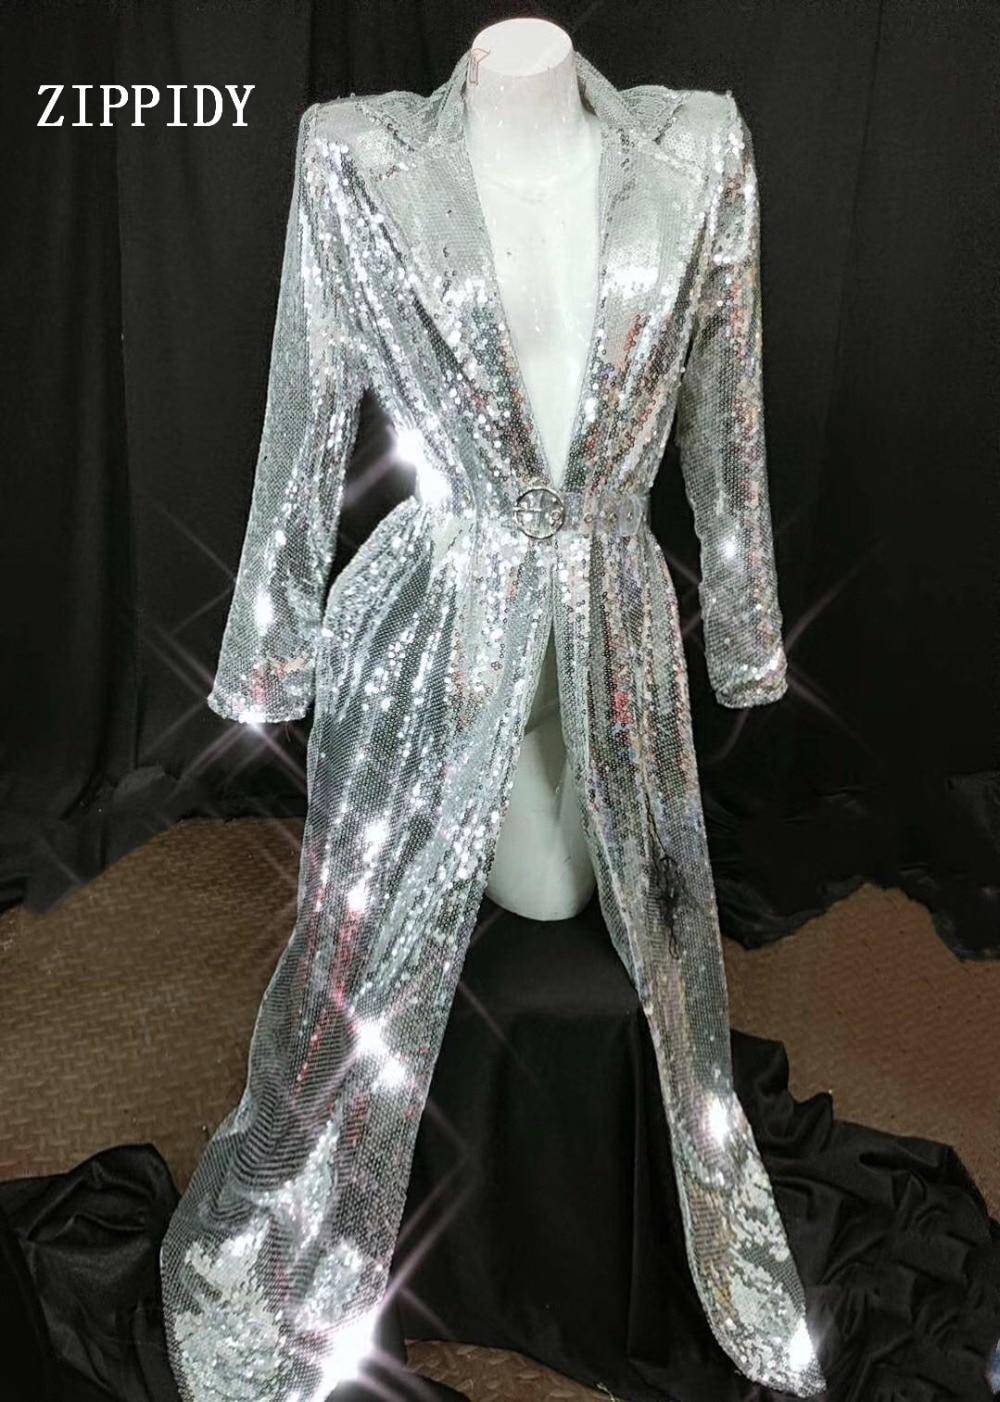 2019 Fashion Women Sequins Coat Female Singer DJ Stage Show Silver Jacket Cloak Strap Ds Performance Costume